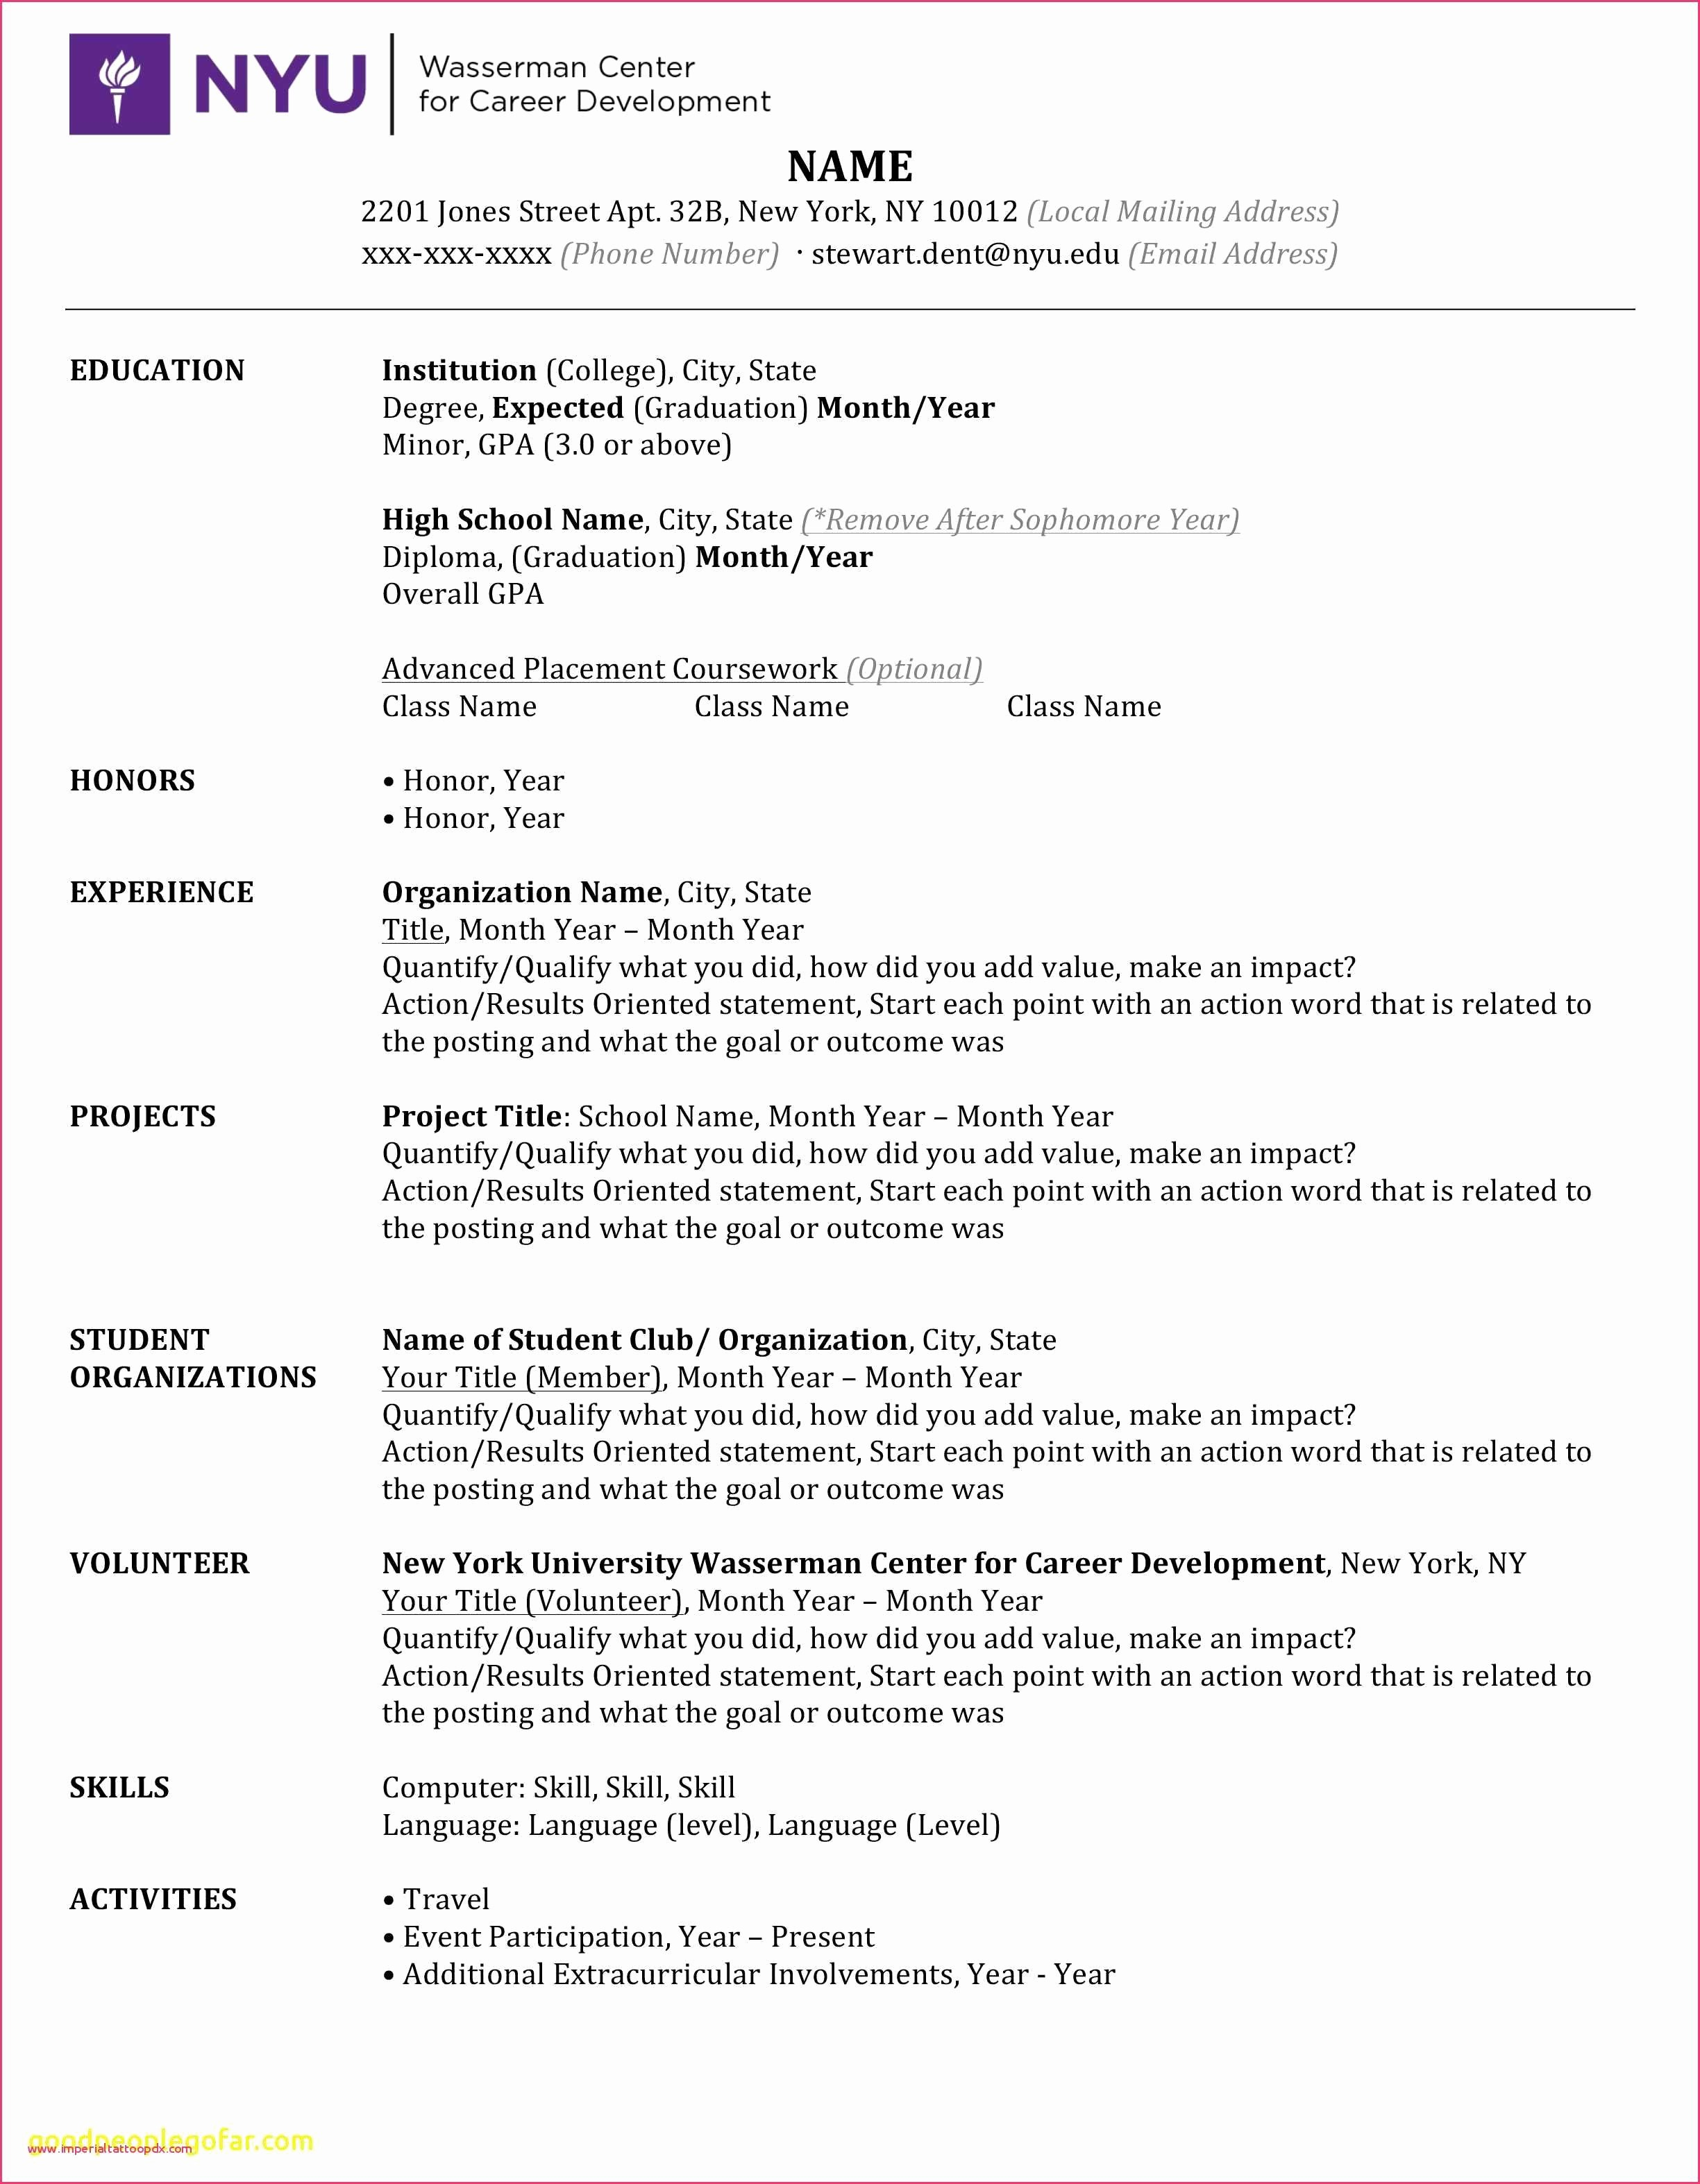 Microsoft Word 2007 Resume Templates Unique 46 Resume Template Download for Microsoft Word 2007